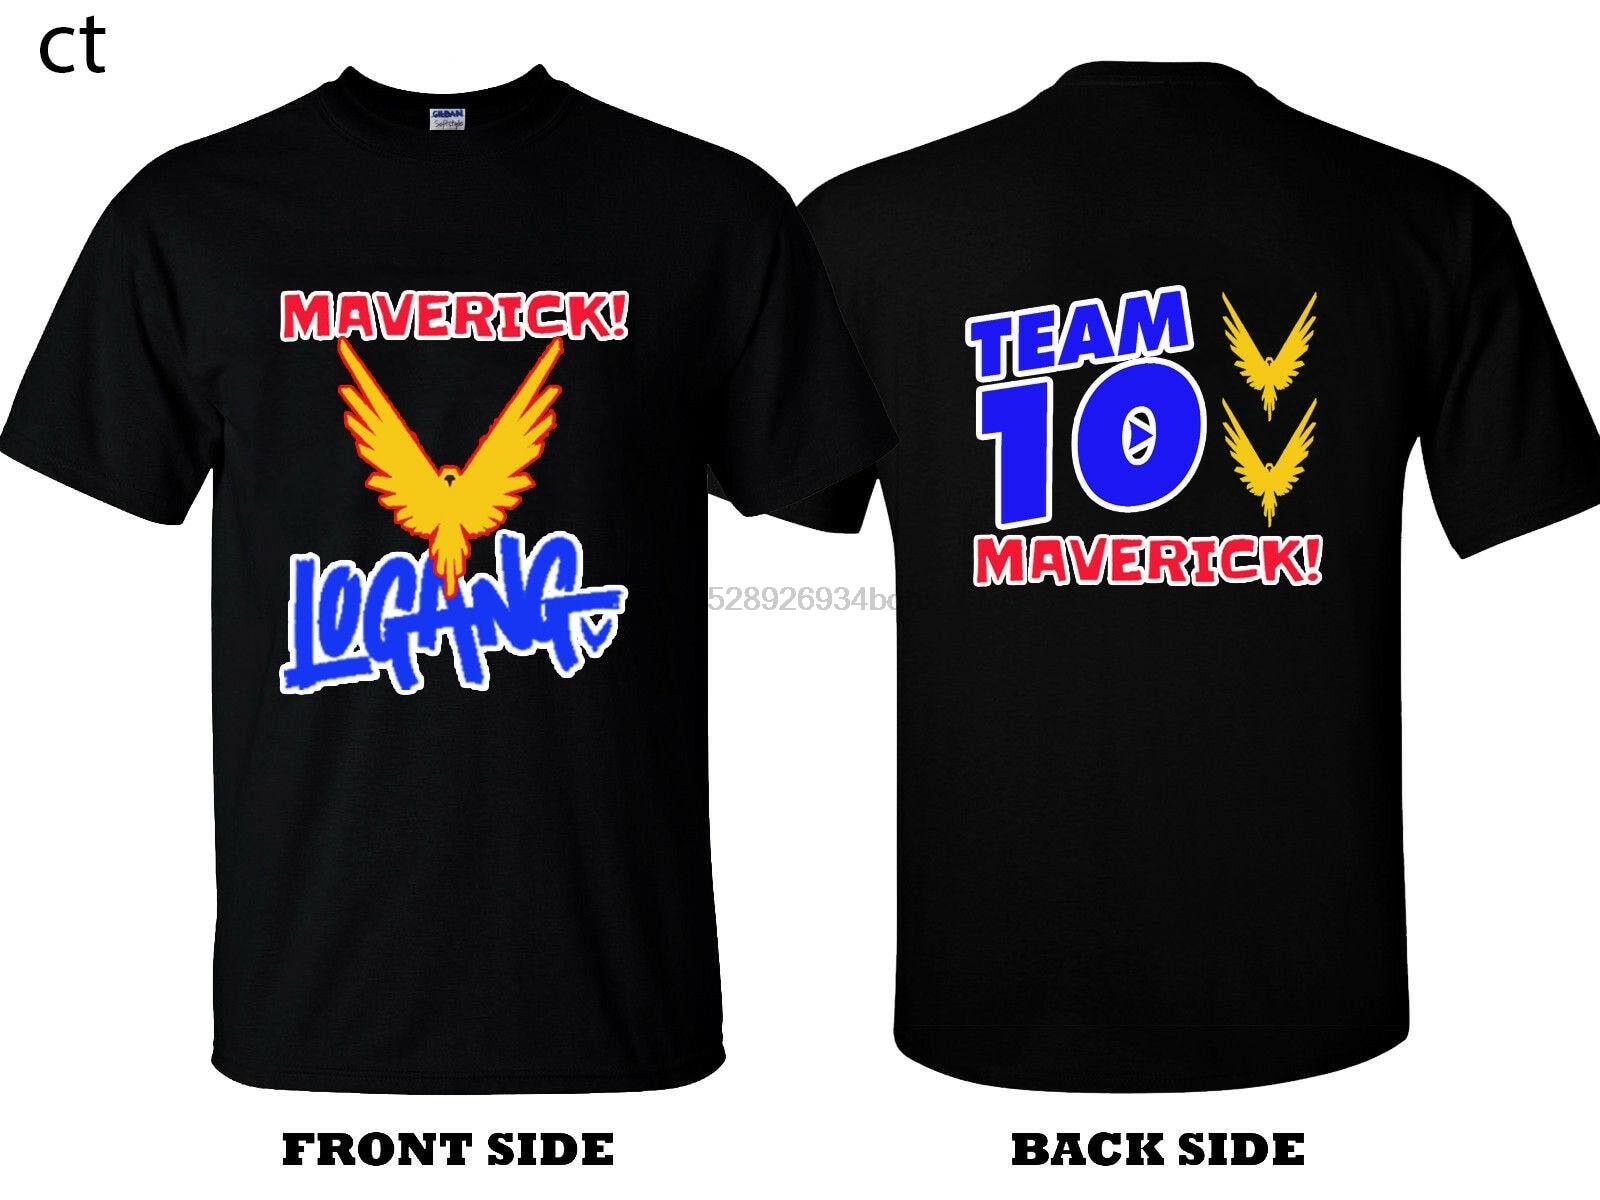 2017 Maverick Bird Color Merch Logan Paul  T-Shirt Tees Clothing